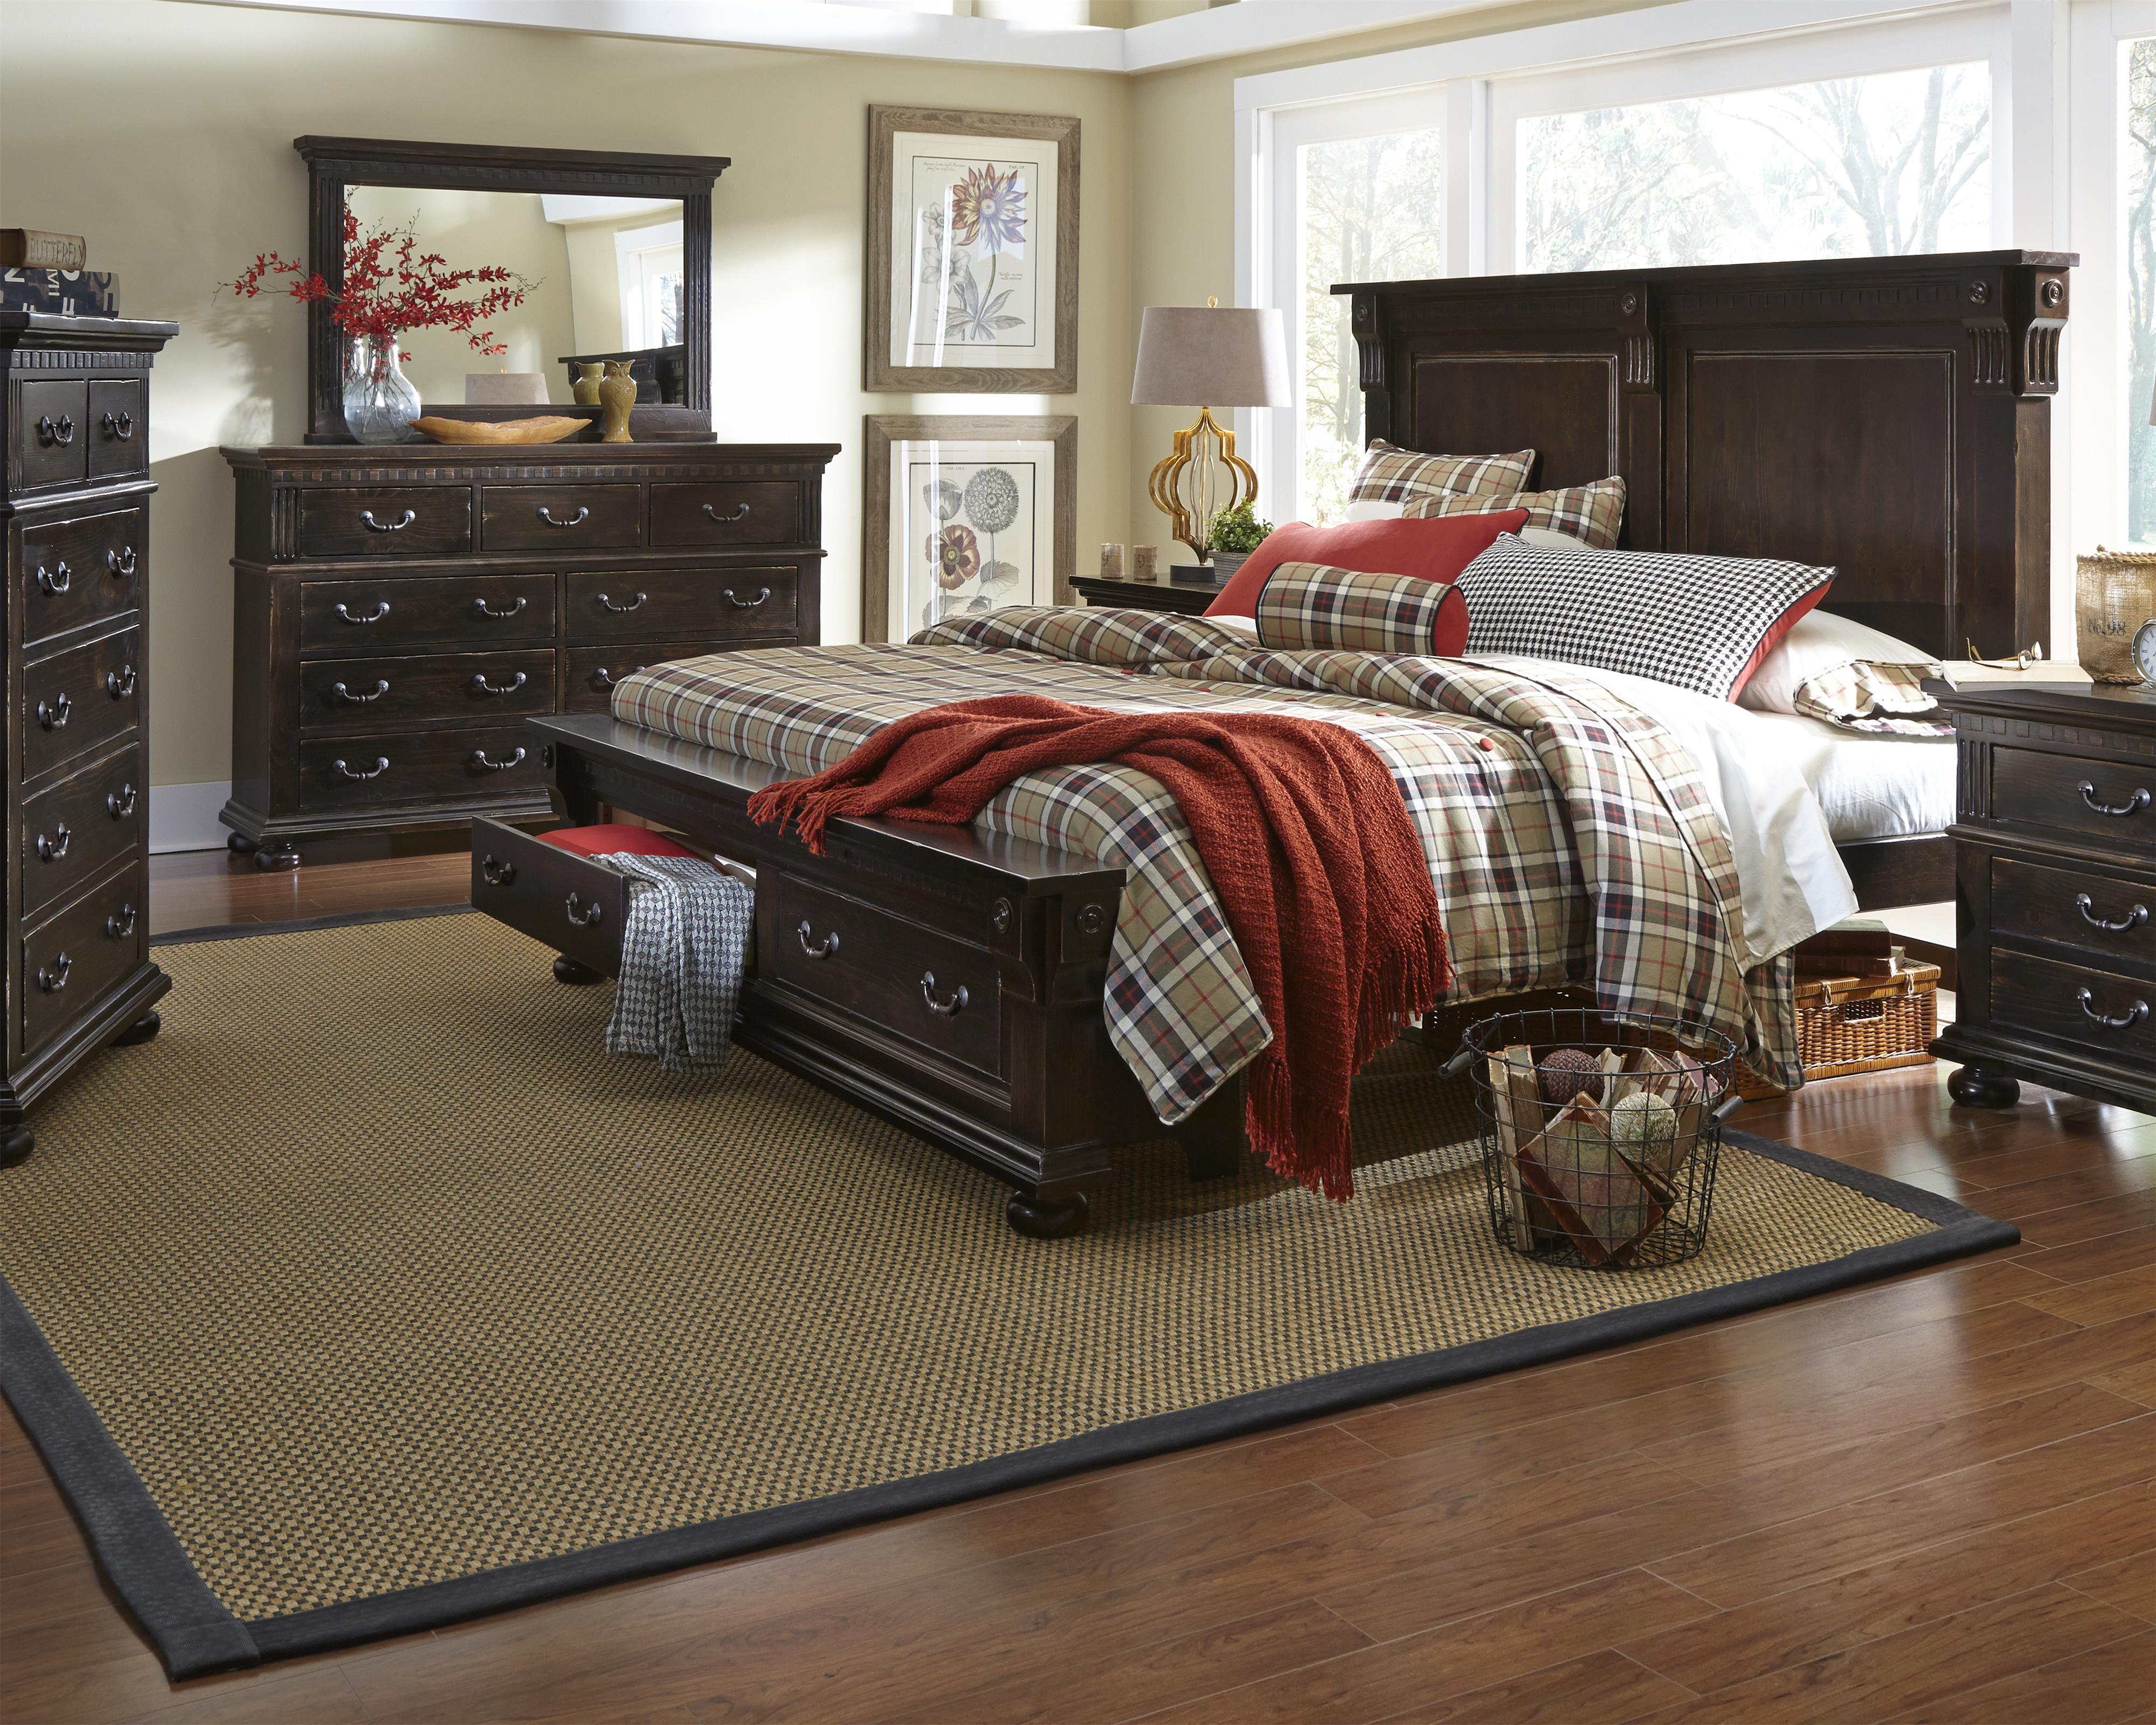 Progressive Furniture La Cantera Queen Bedroom Group - Item Number: P665 Q Bedroom Group 1